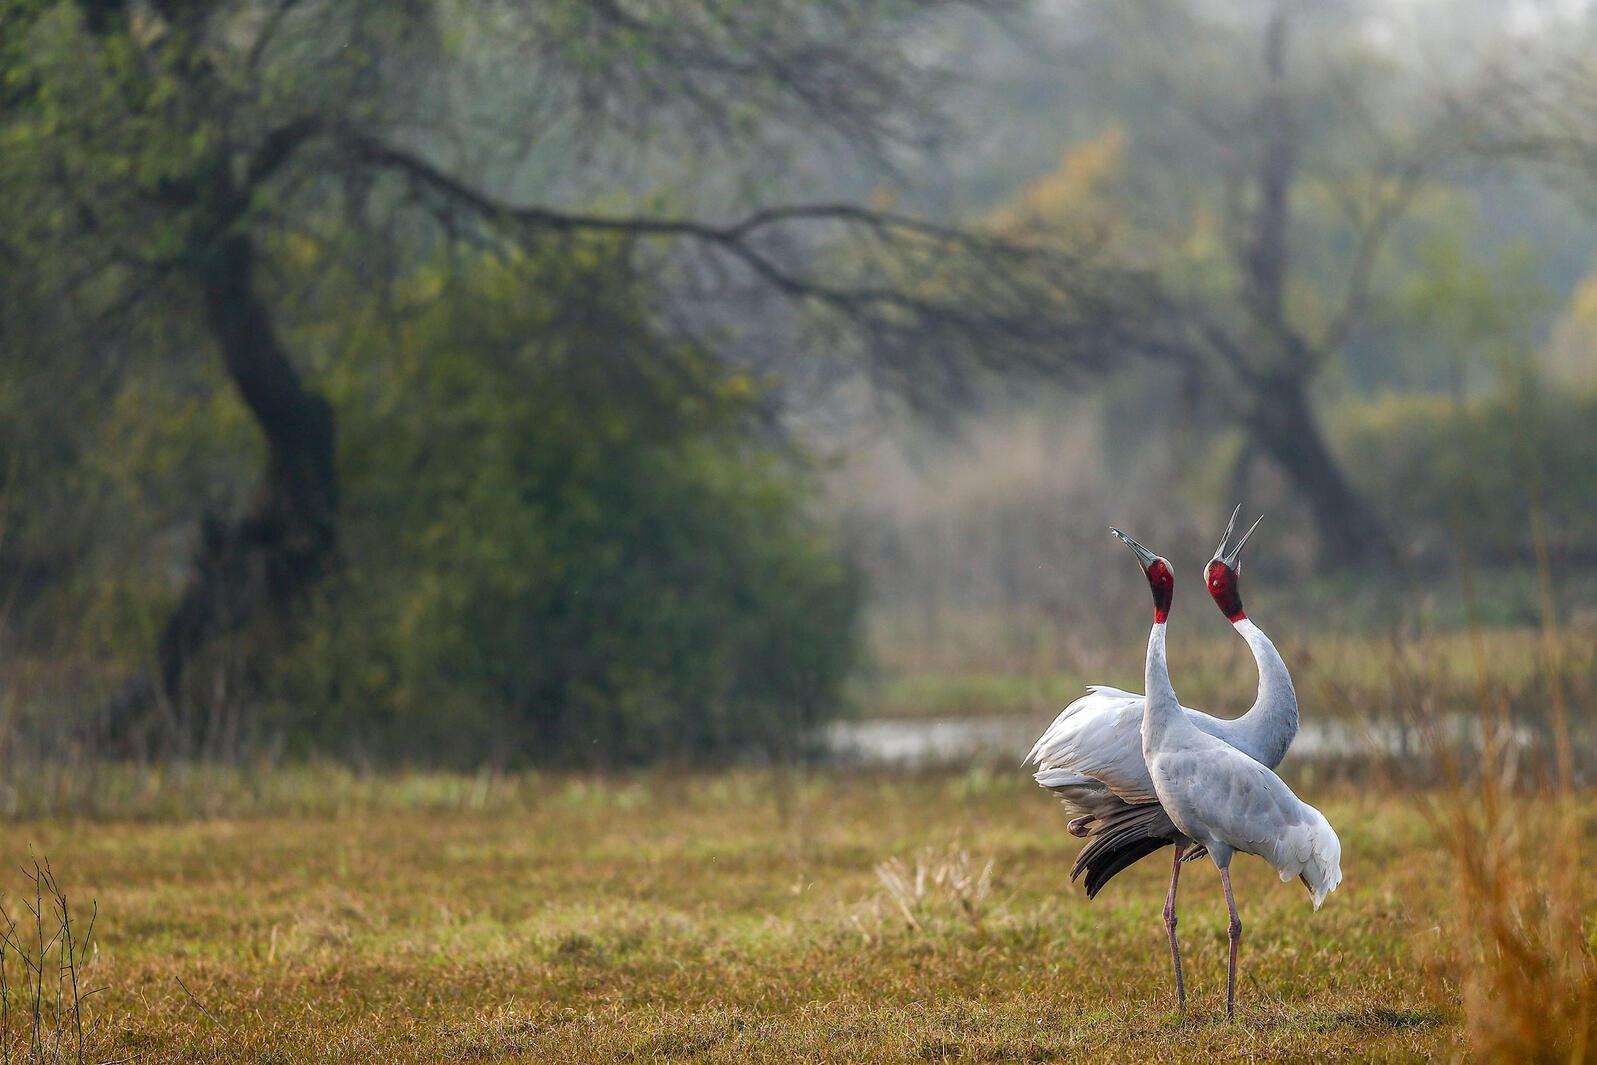 Sarus Cranes. Shivang Mehta/Alamy